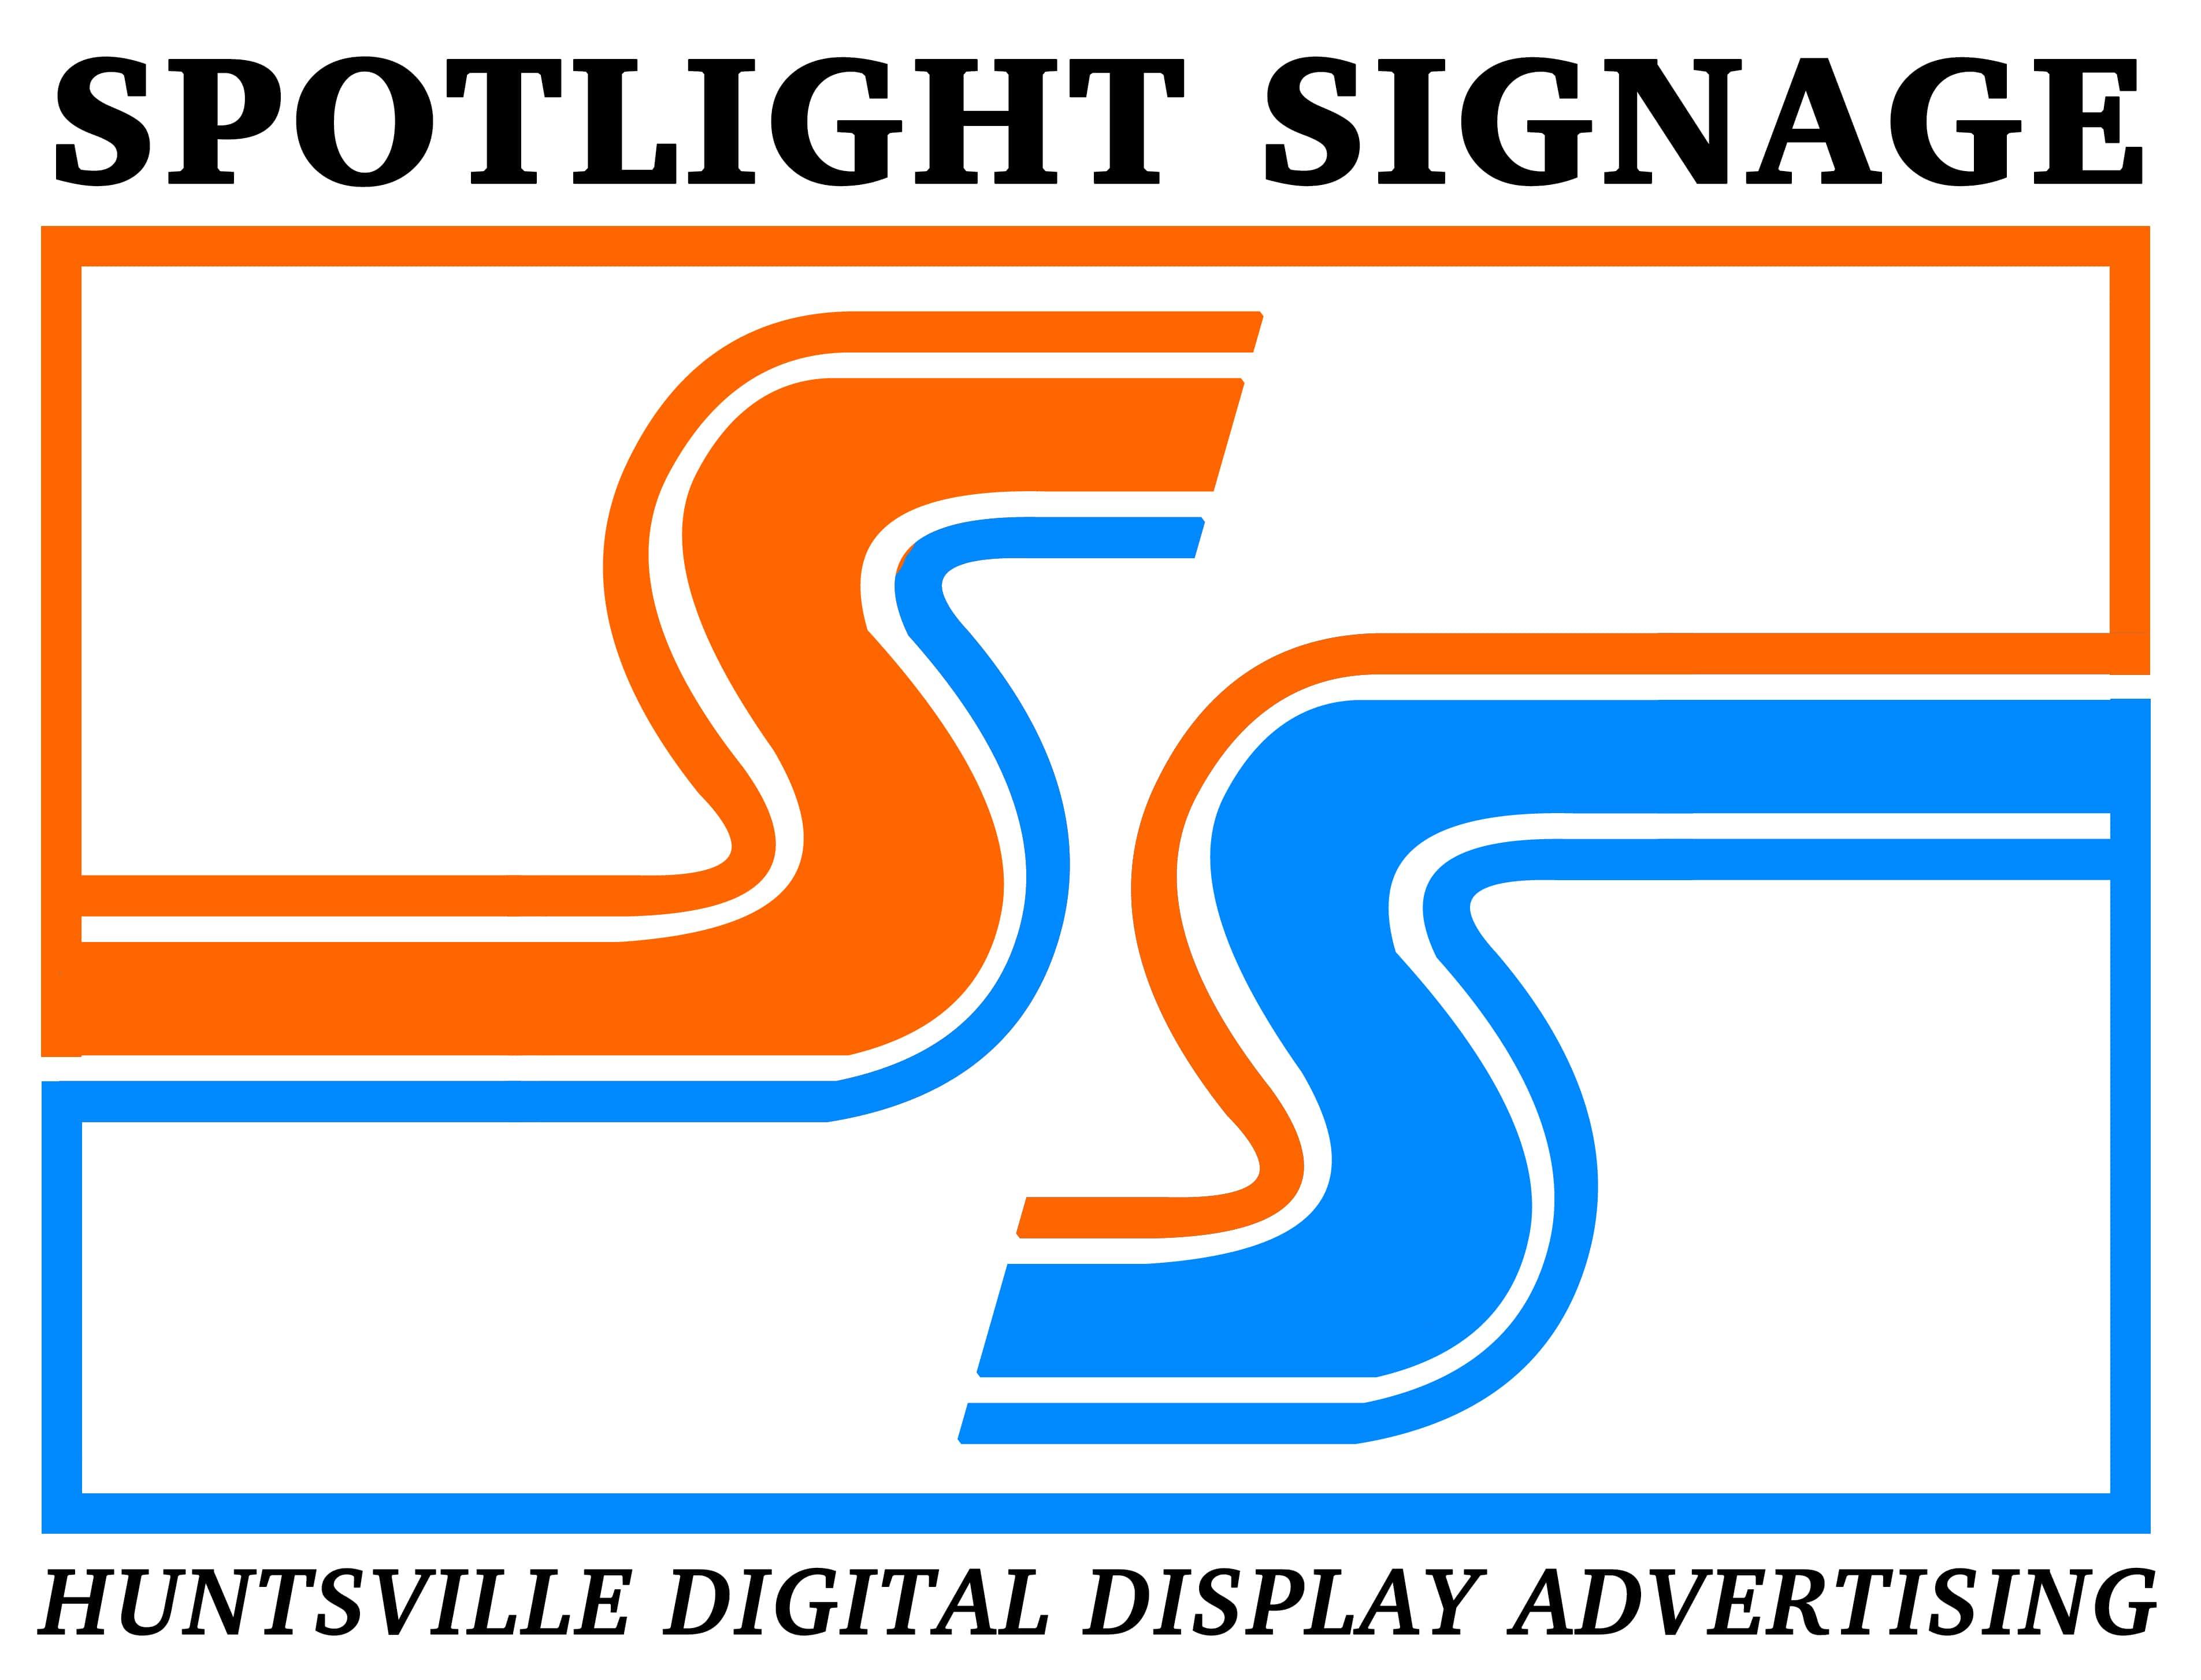 Spotlight Signage